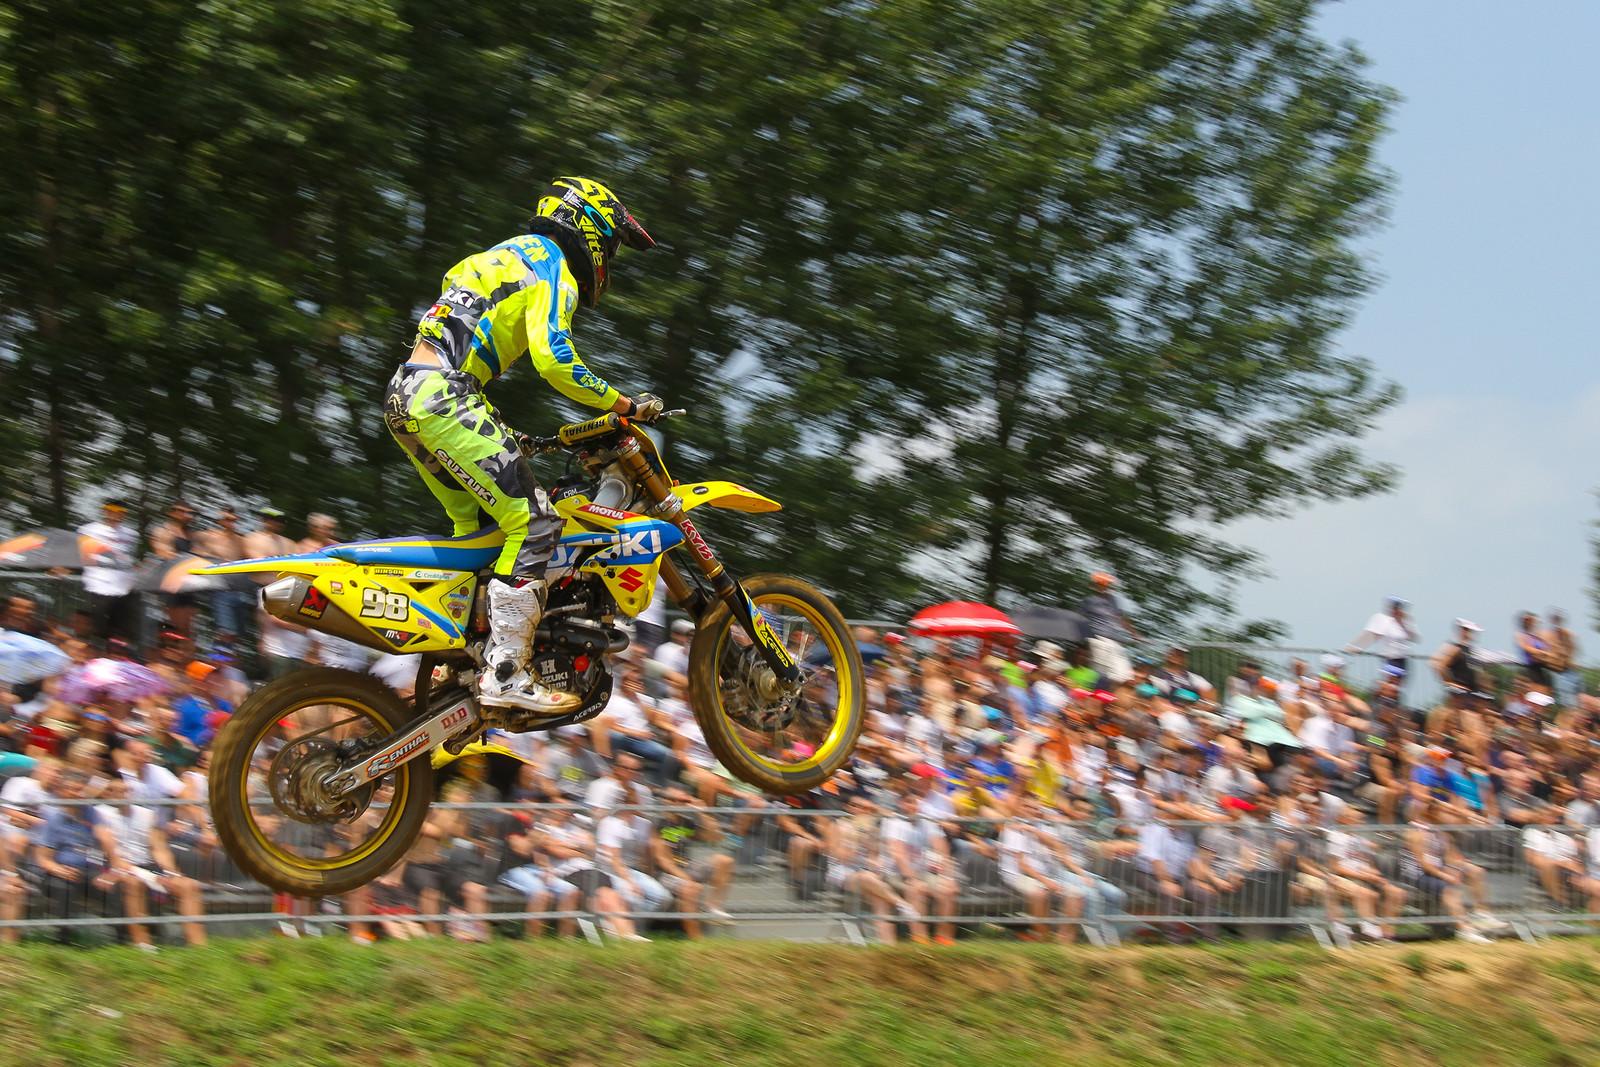 Bas Vaessen - ayearinmx - Motocross Pictures - Vital MX